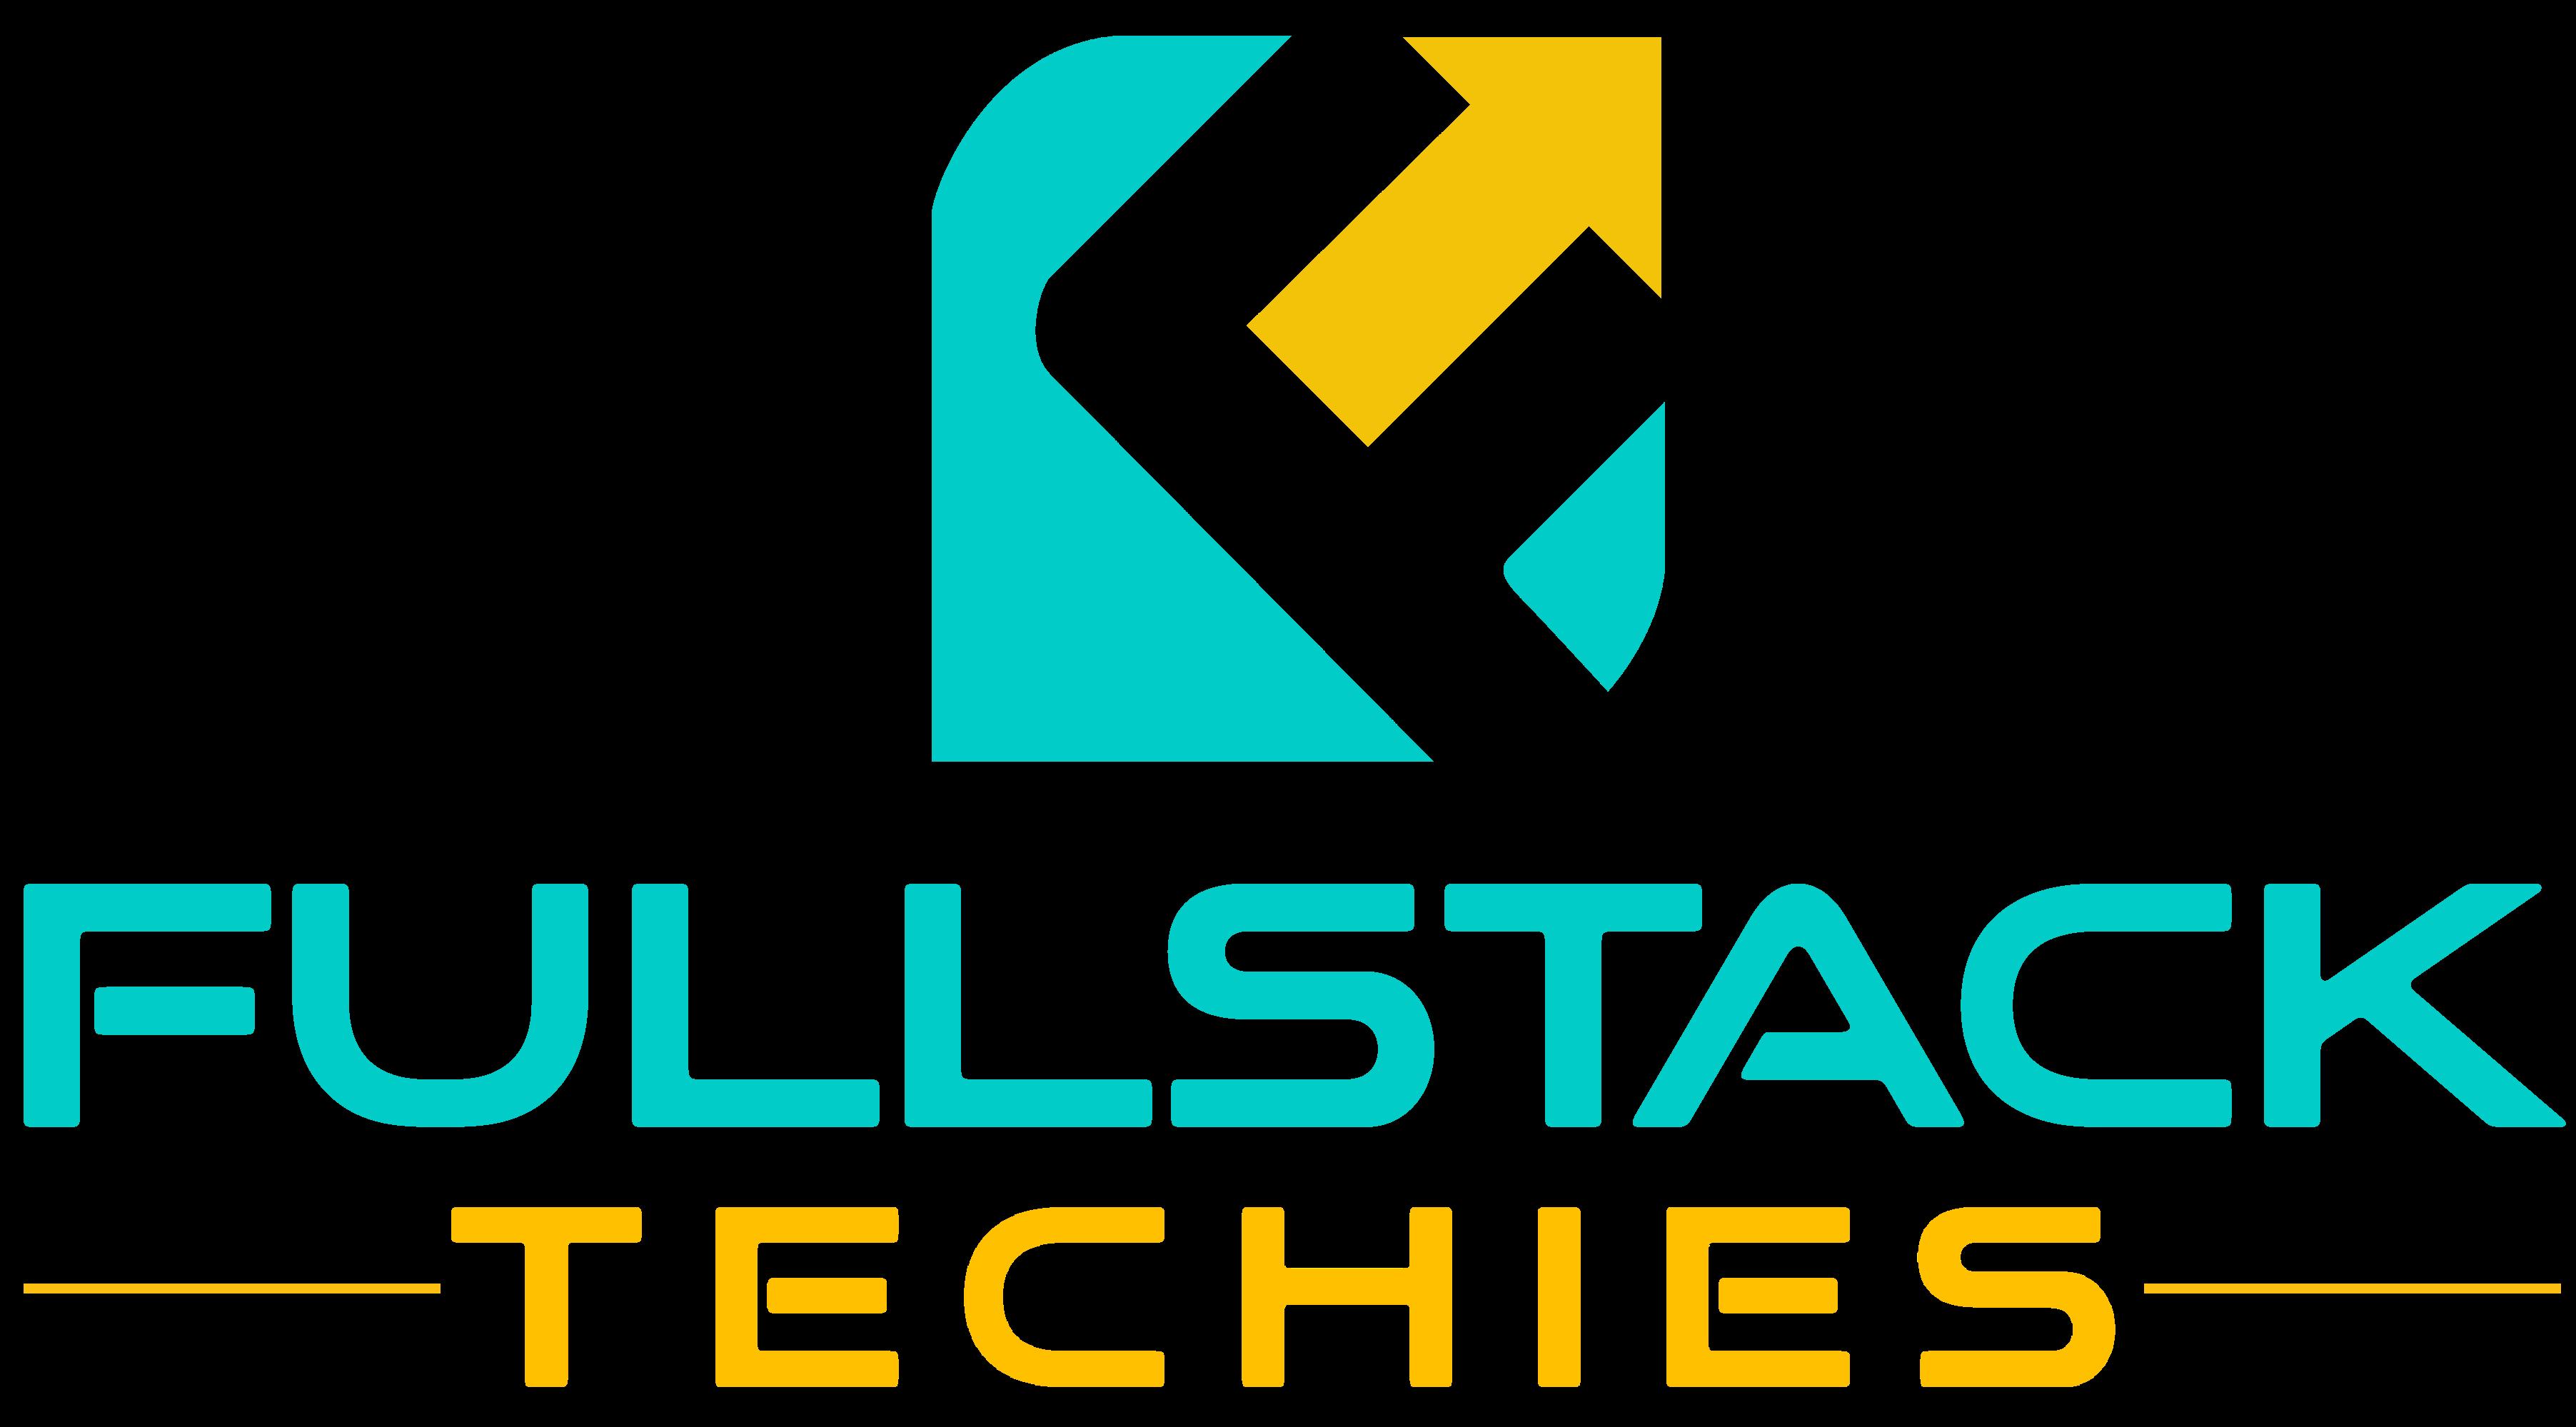 FullStackTechies